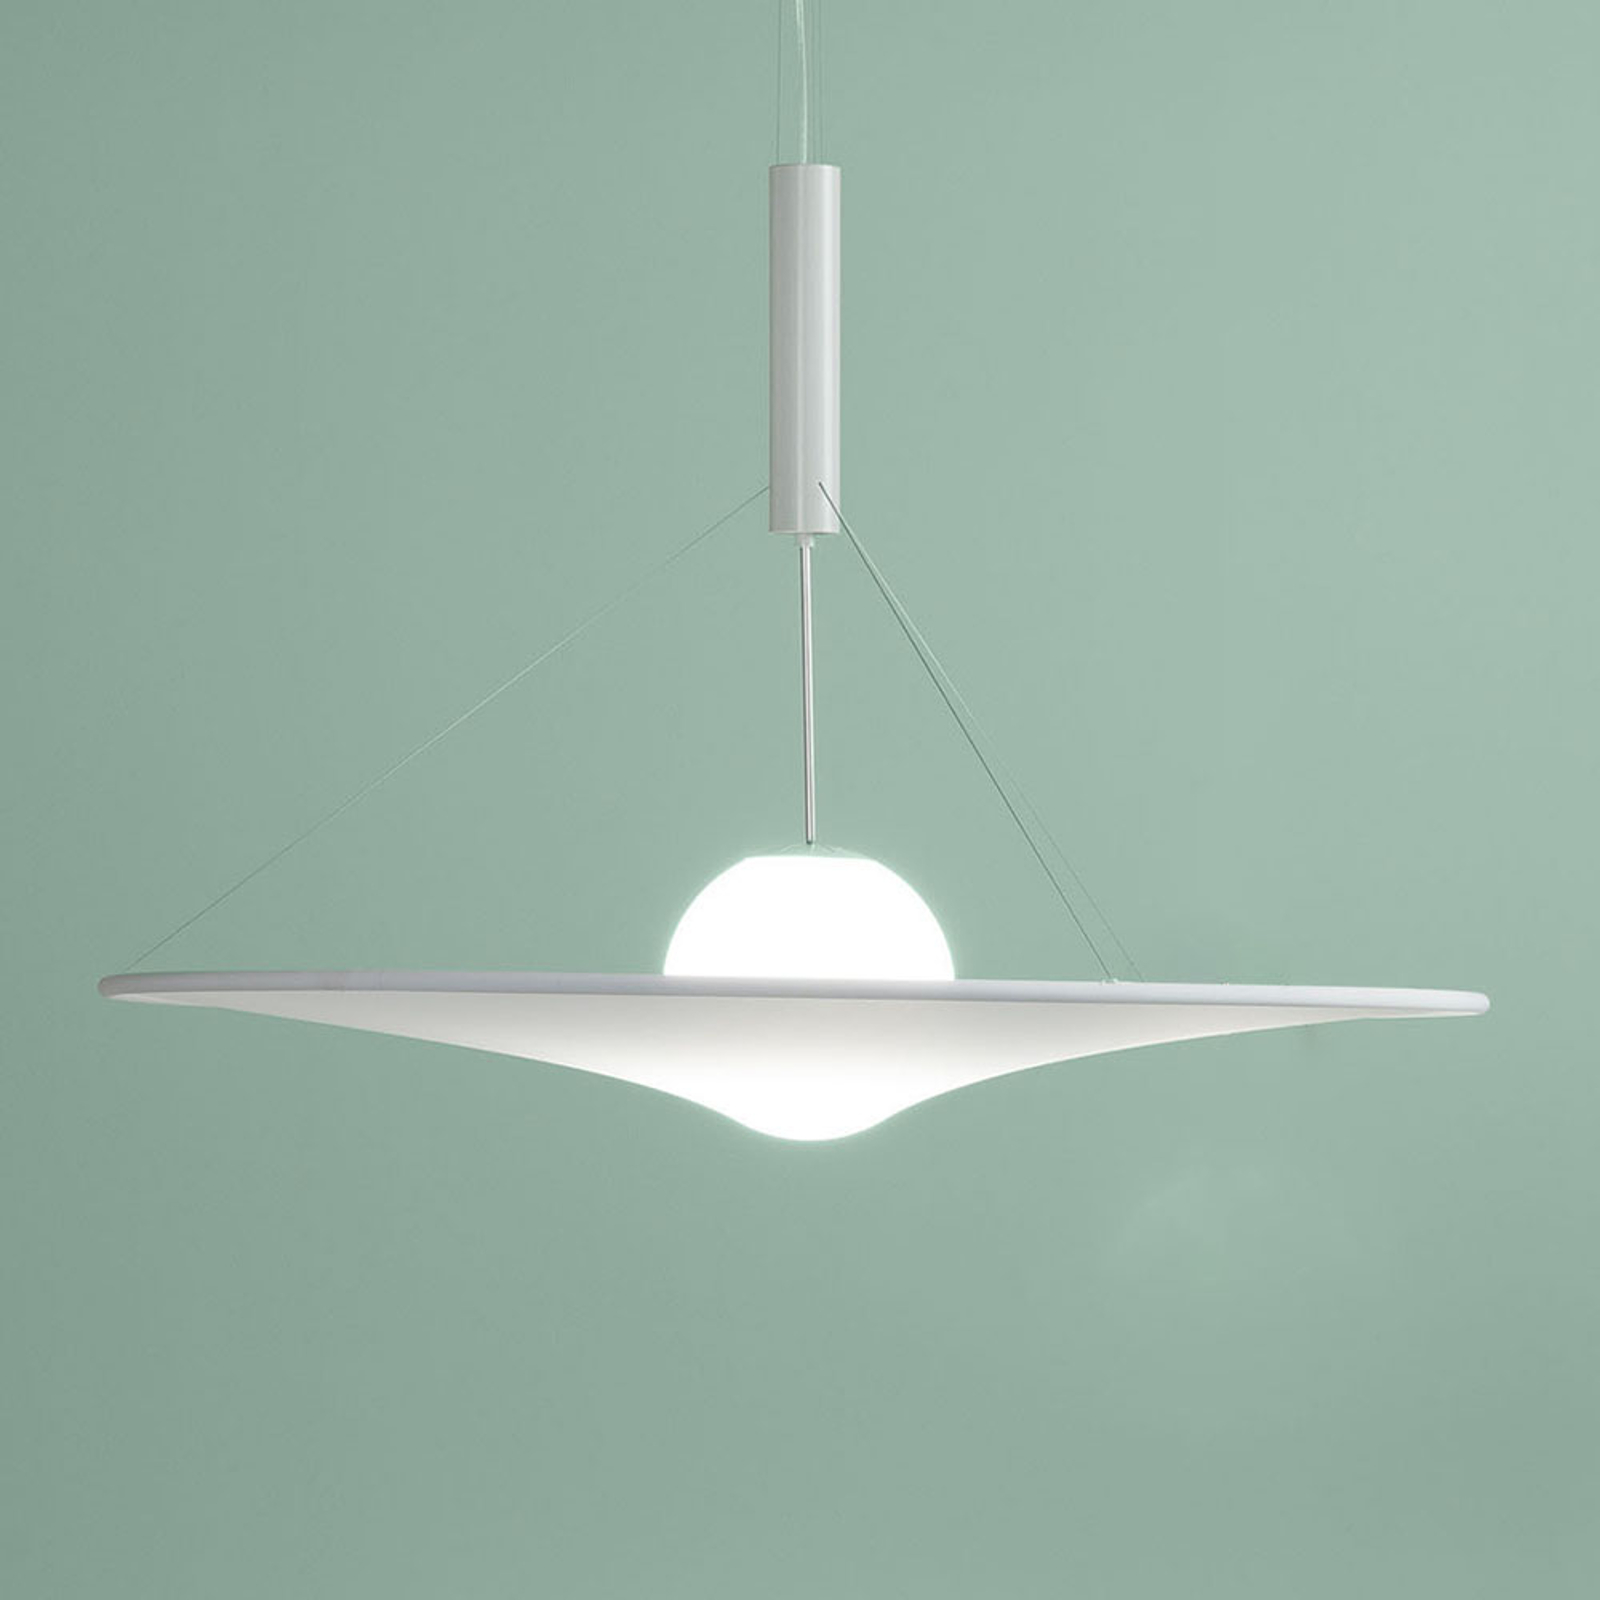 Axolight Manto LED-Designer-Pendelleuchte, Ø 180cm